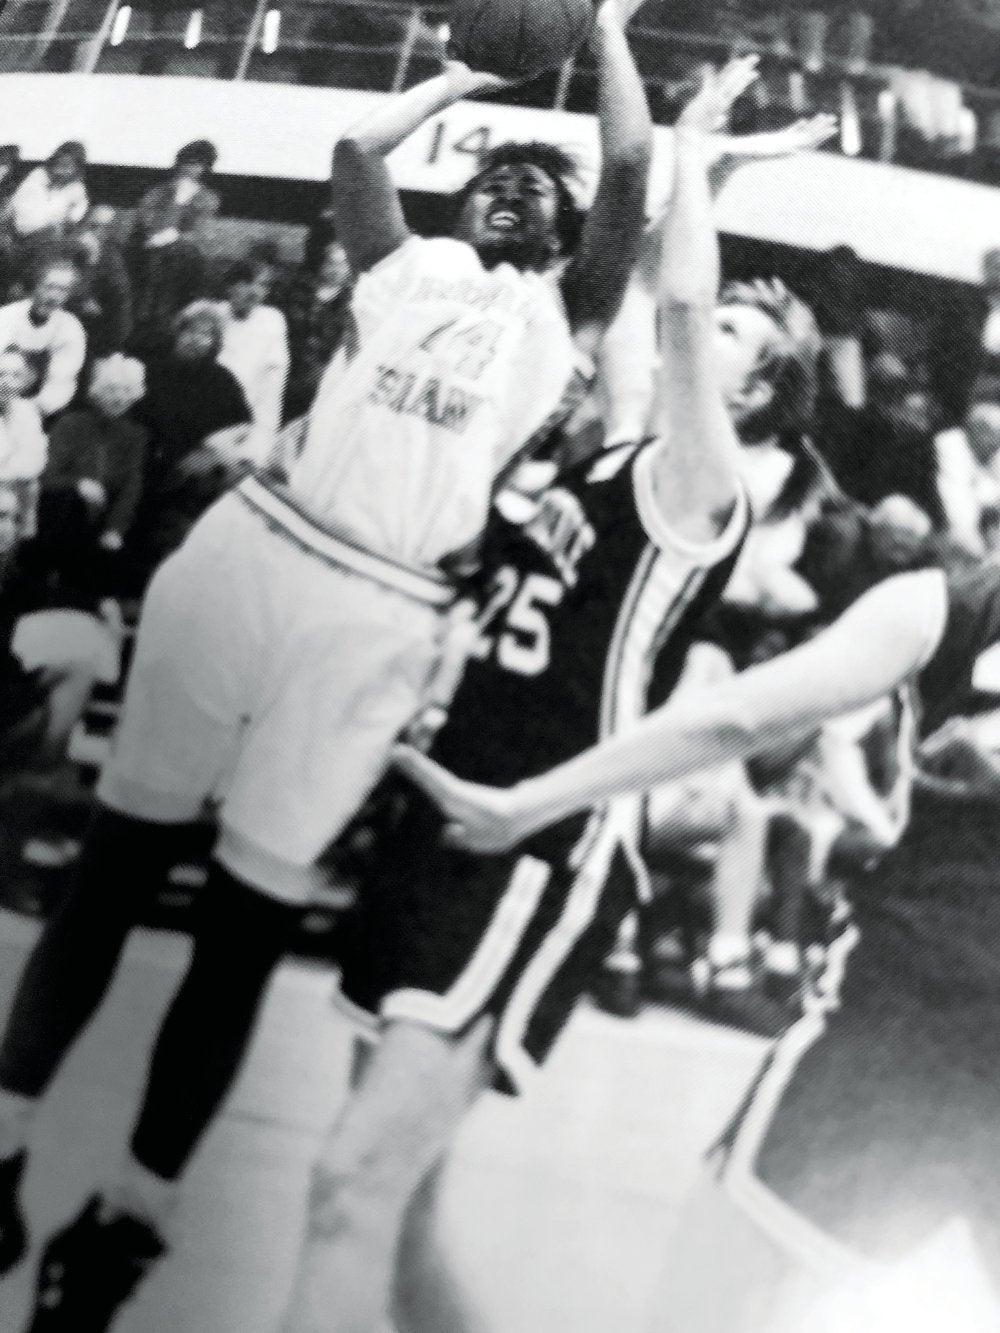 Monica Barnes taking a shot during a URI basketball game